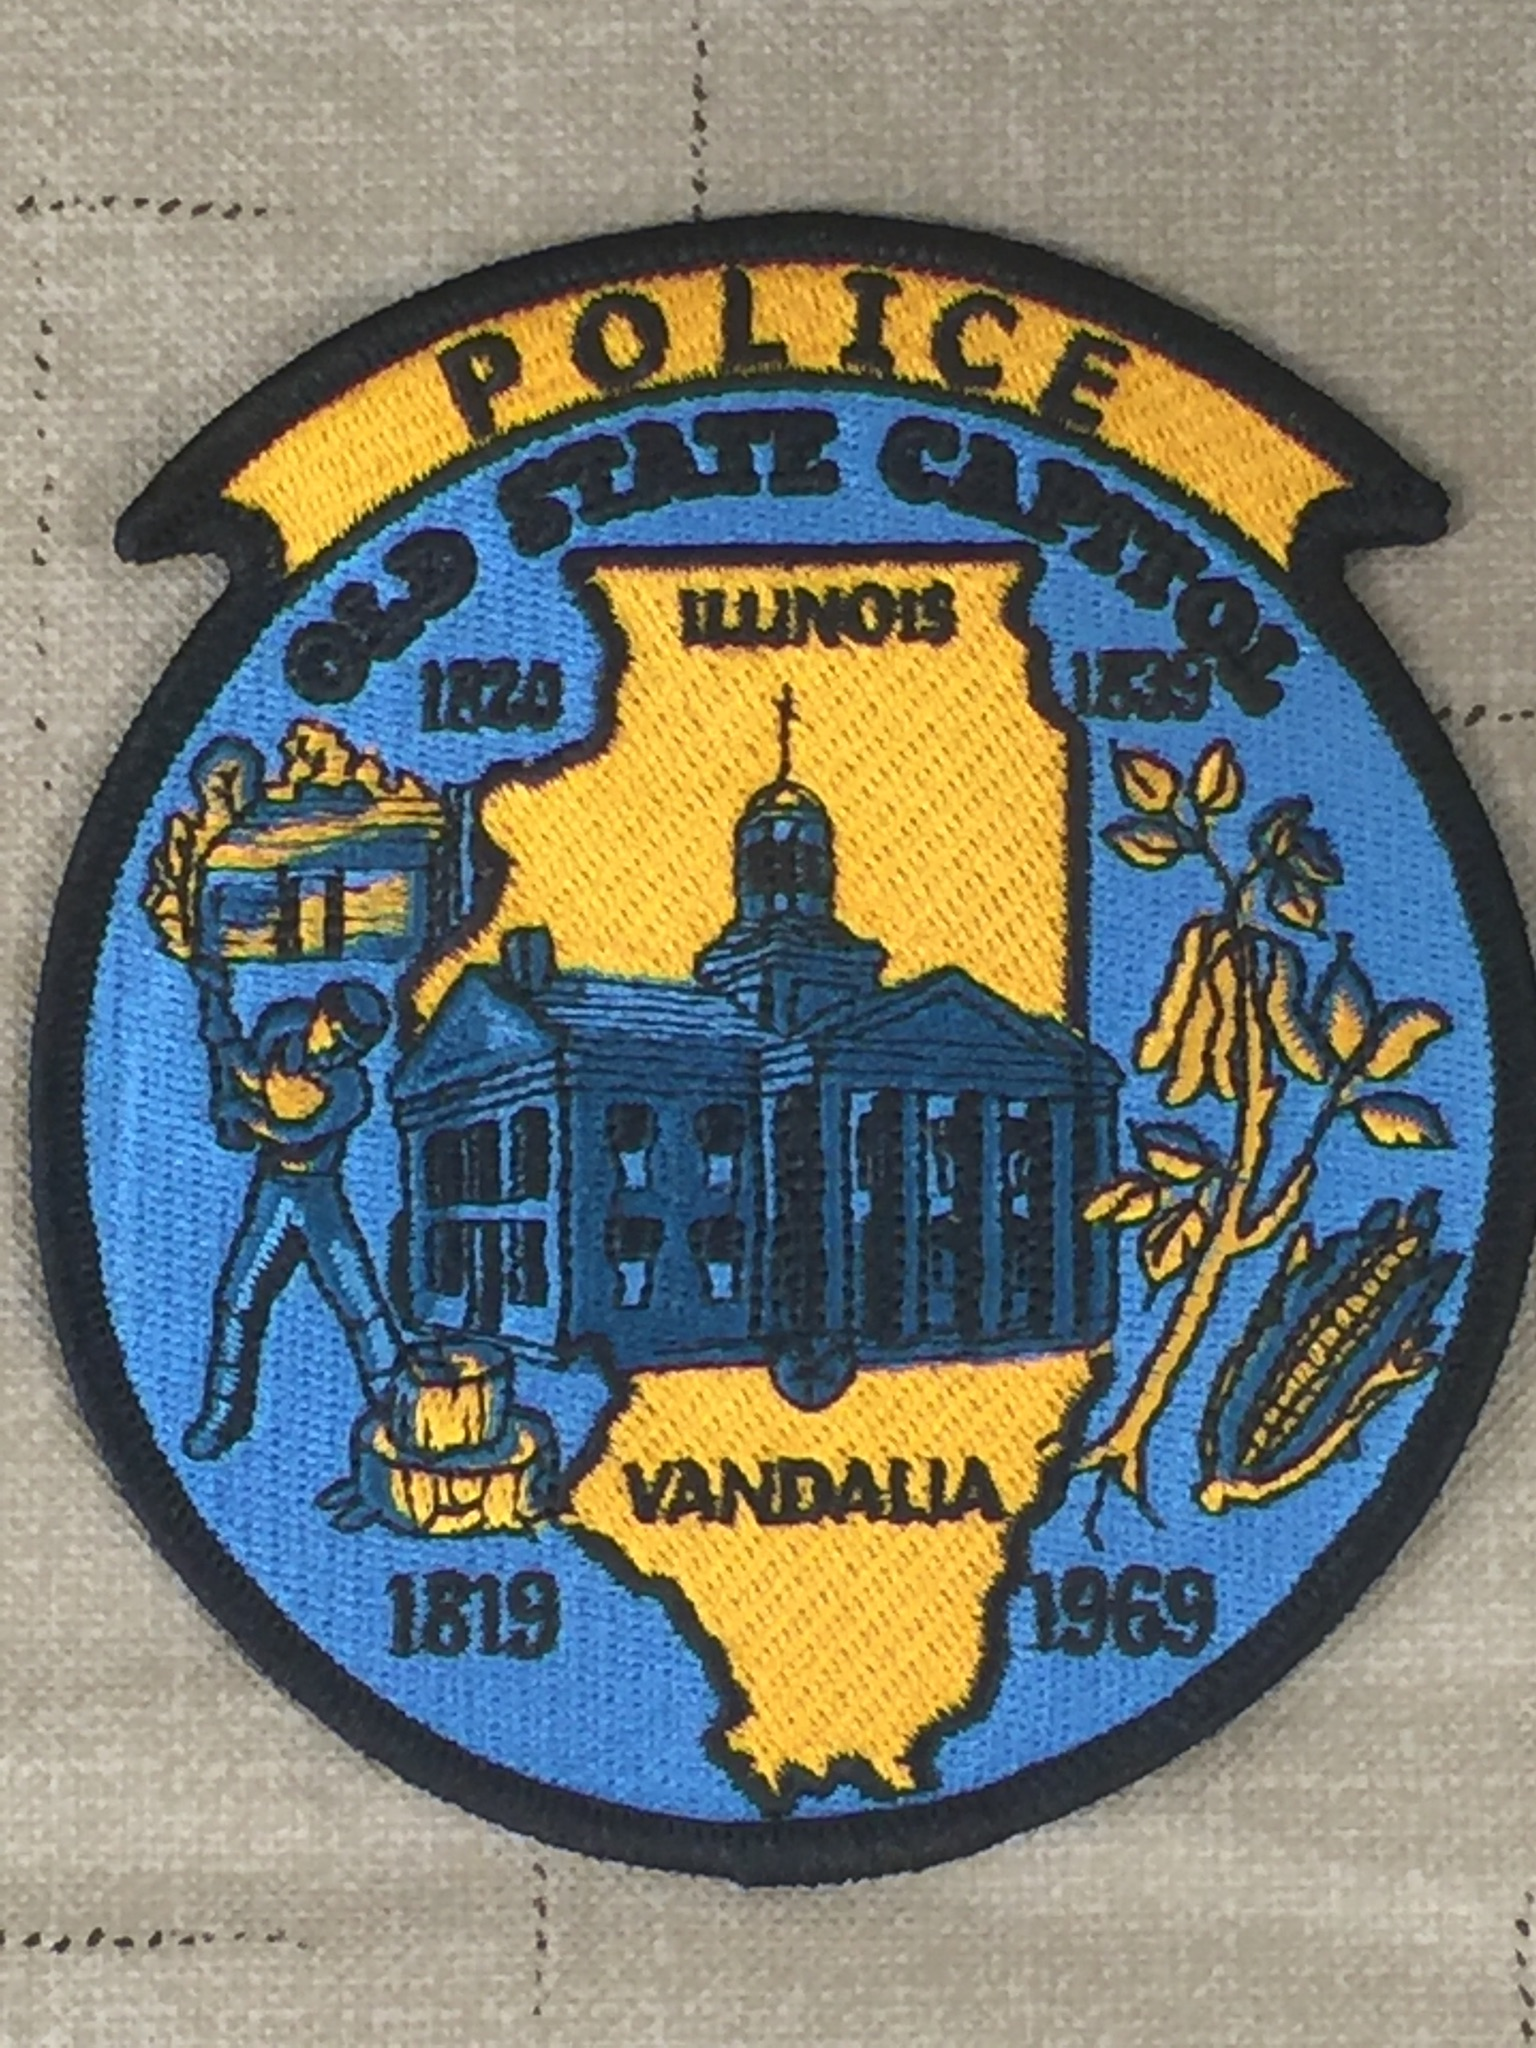 City of Vandalia Police Car Damaged by Wrong Way Driver